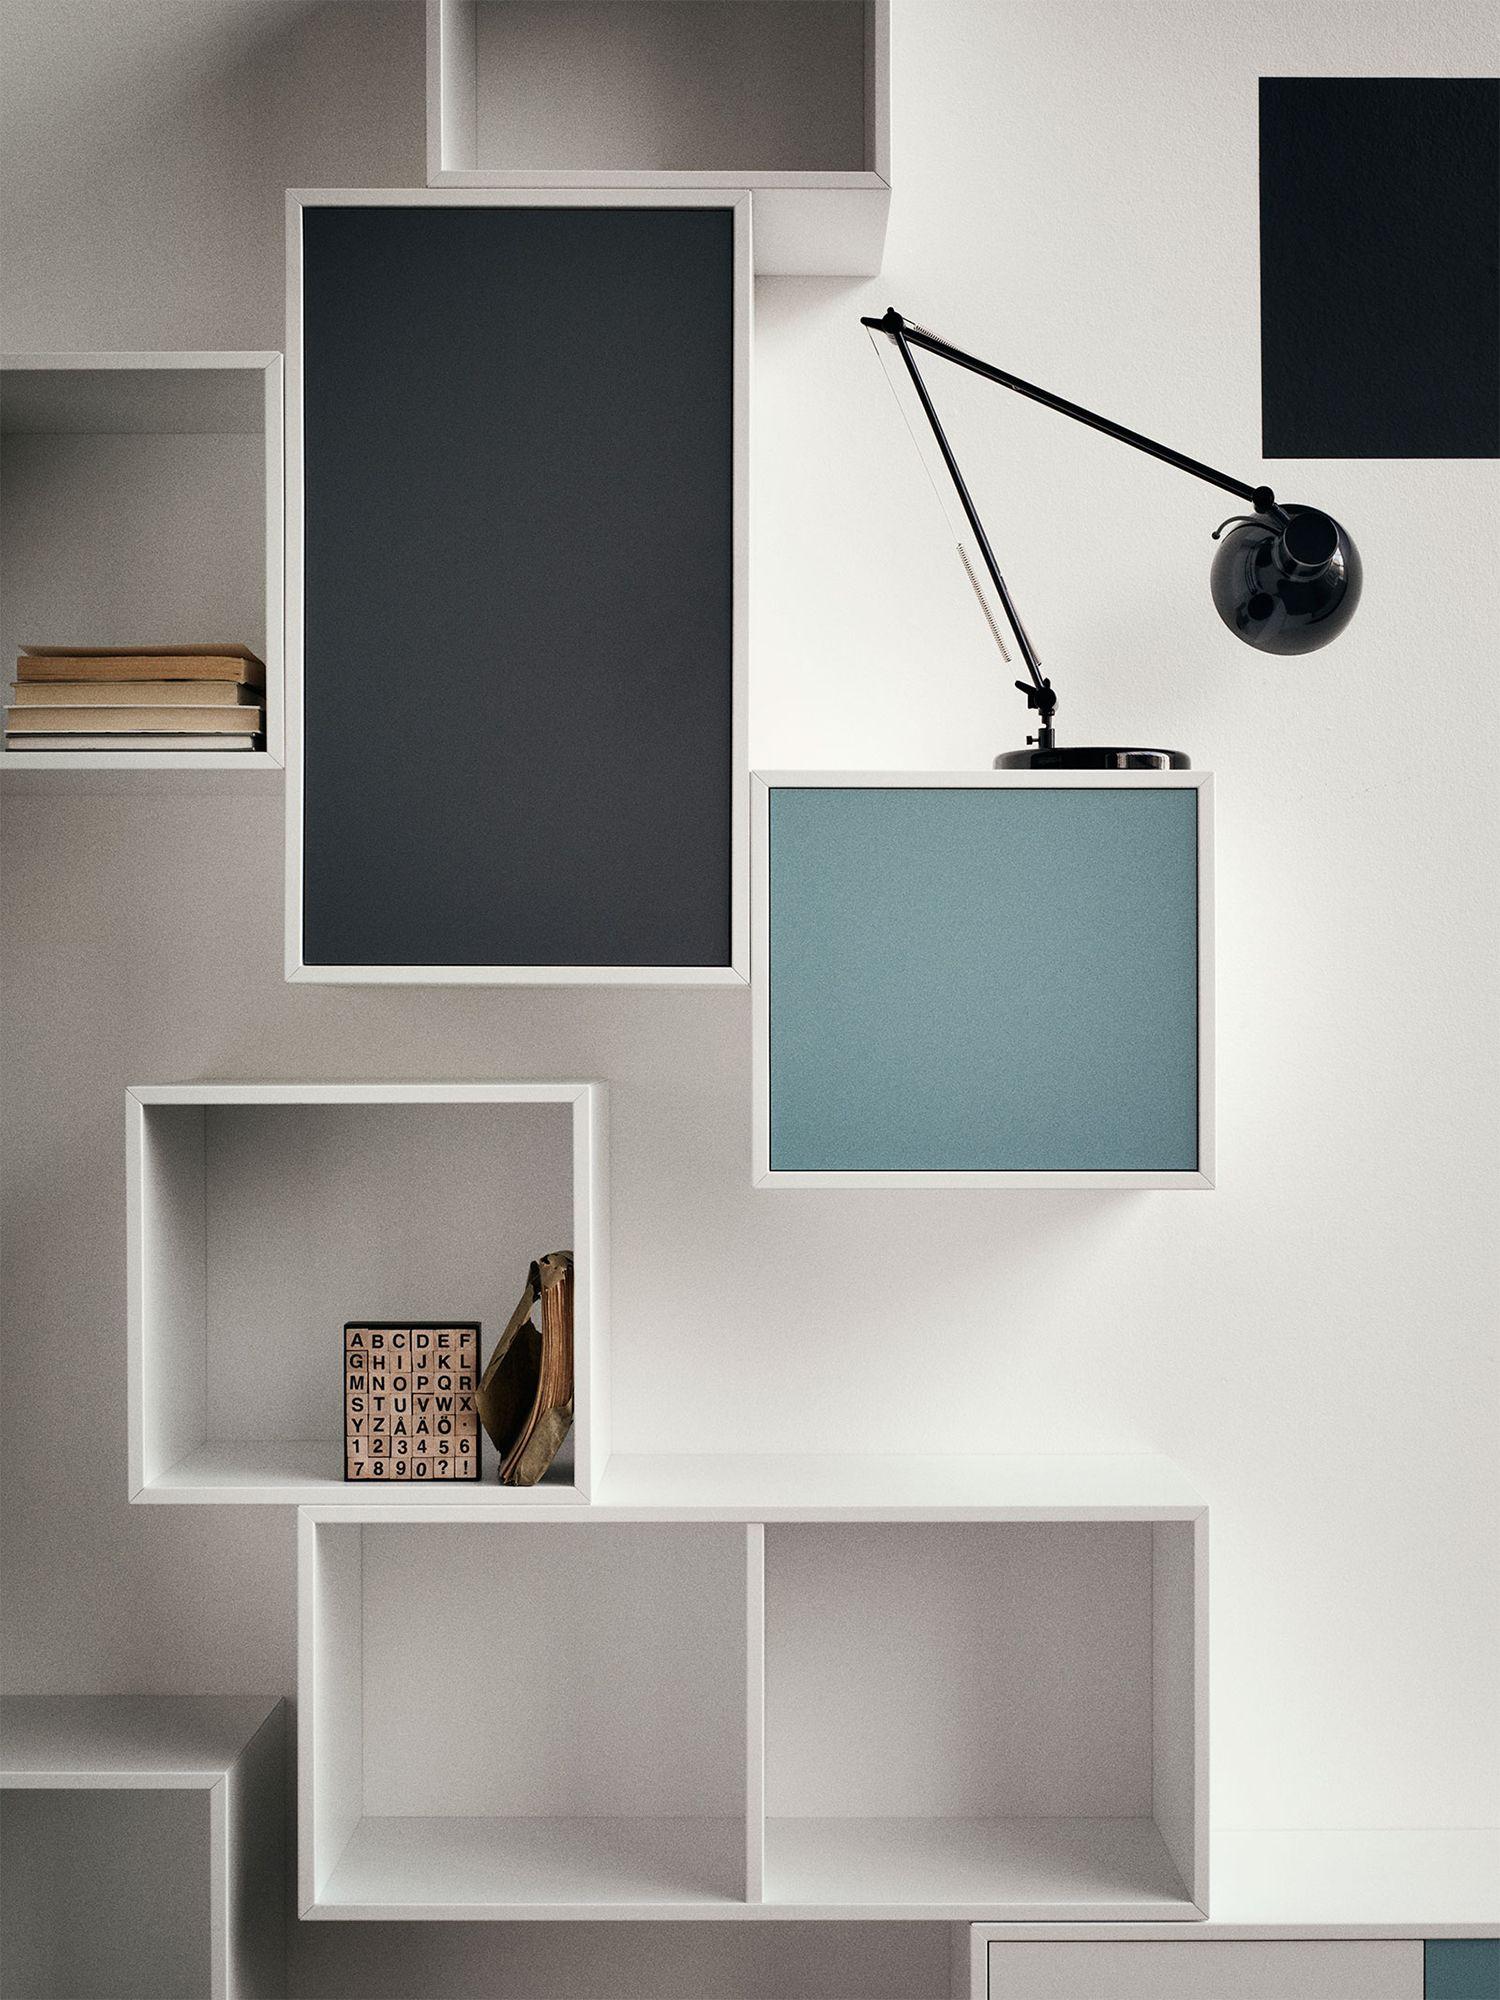 Bolia - Logo cell reol   LivingStyle   Pinterest   Home Decor, Home and Shelves